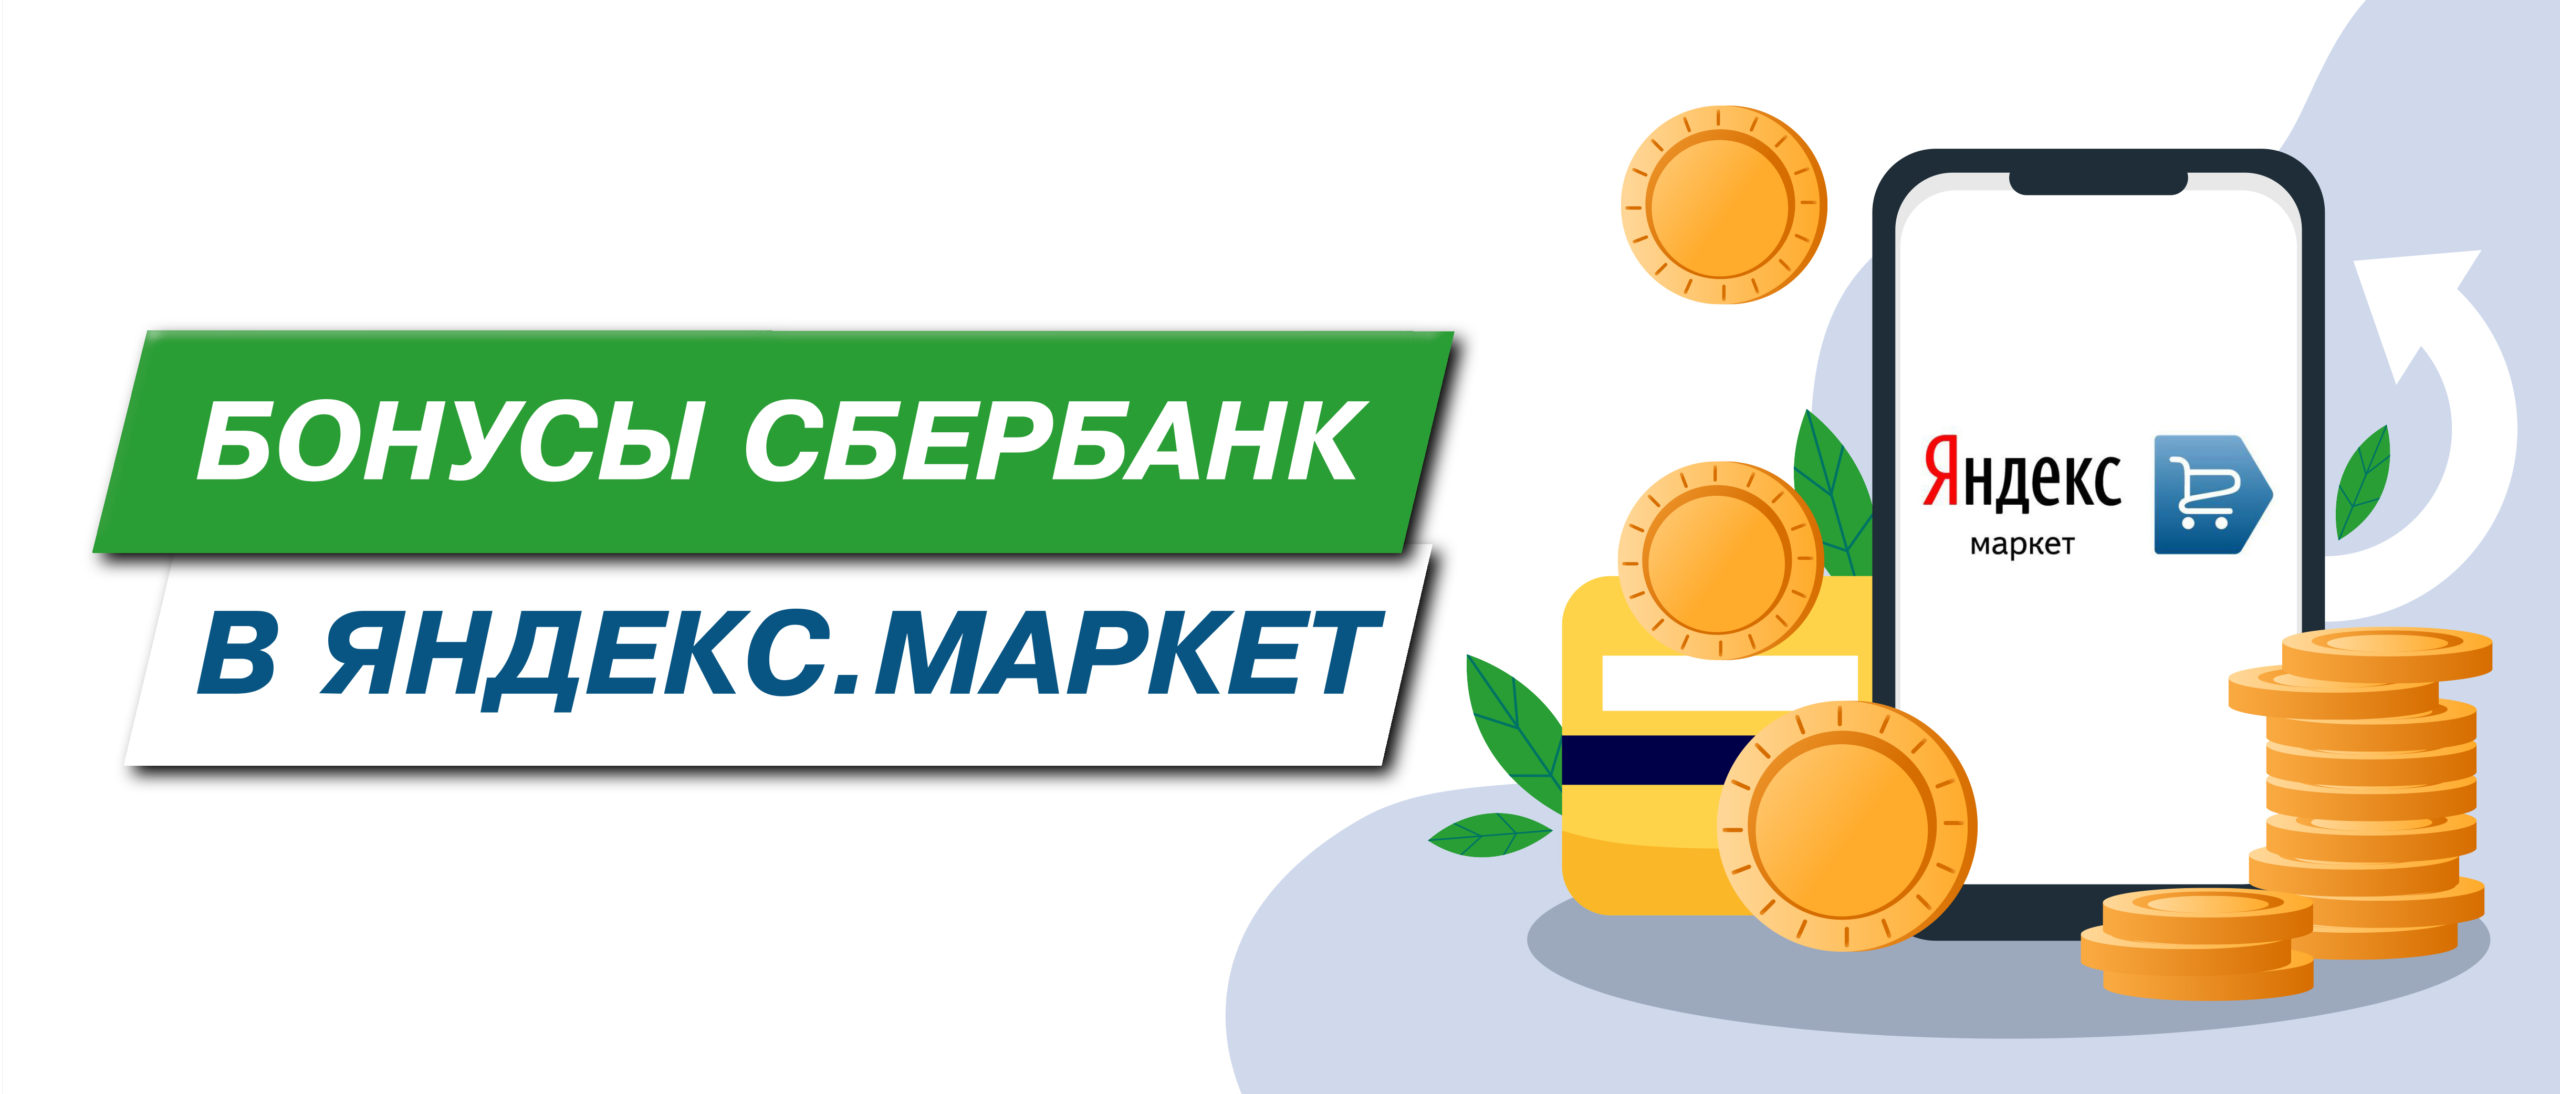 Бонусы от Сбербанка на Яндекс.Маркет